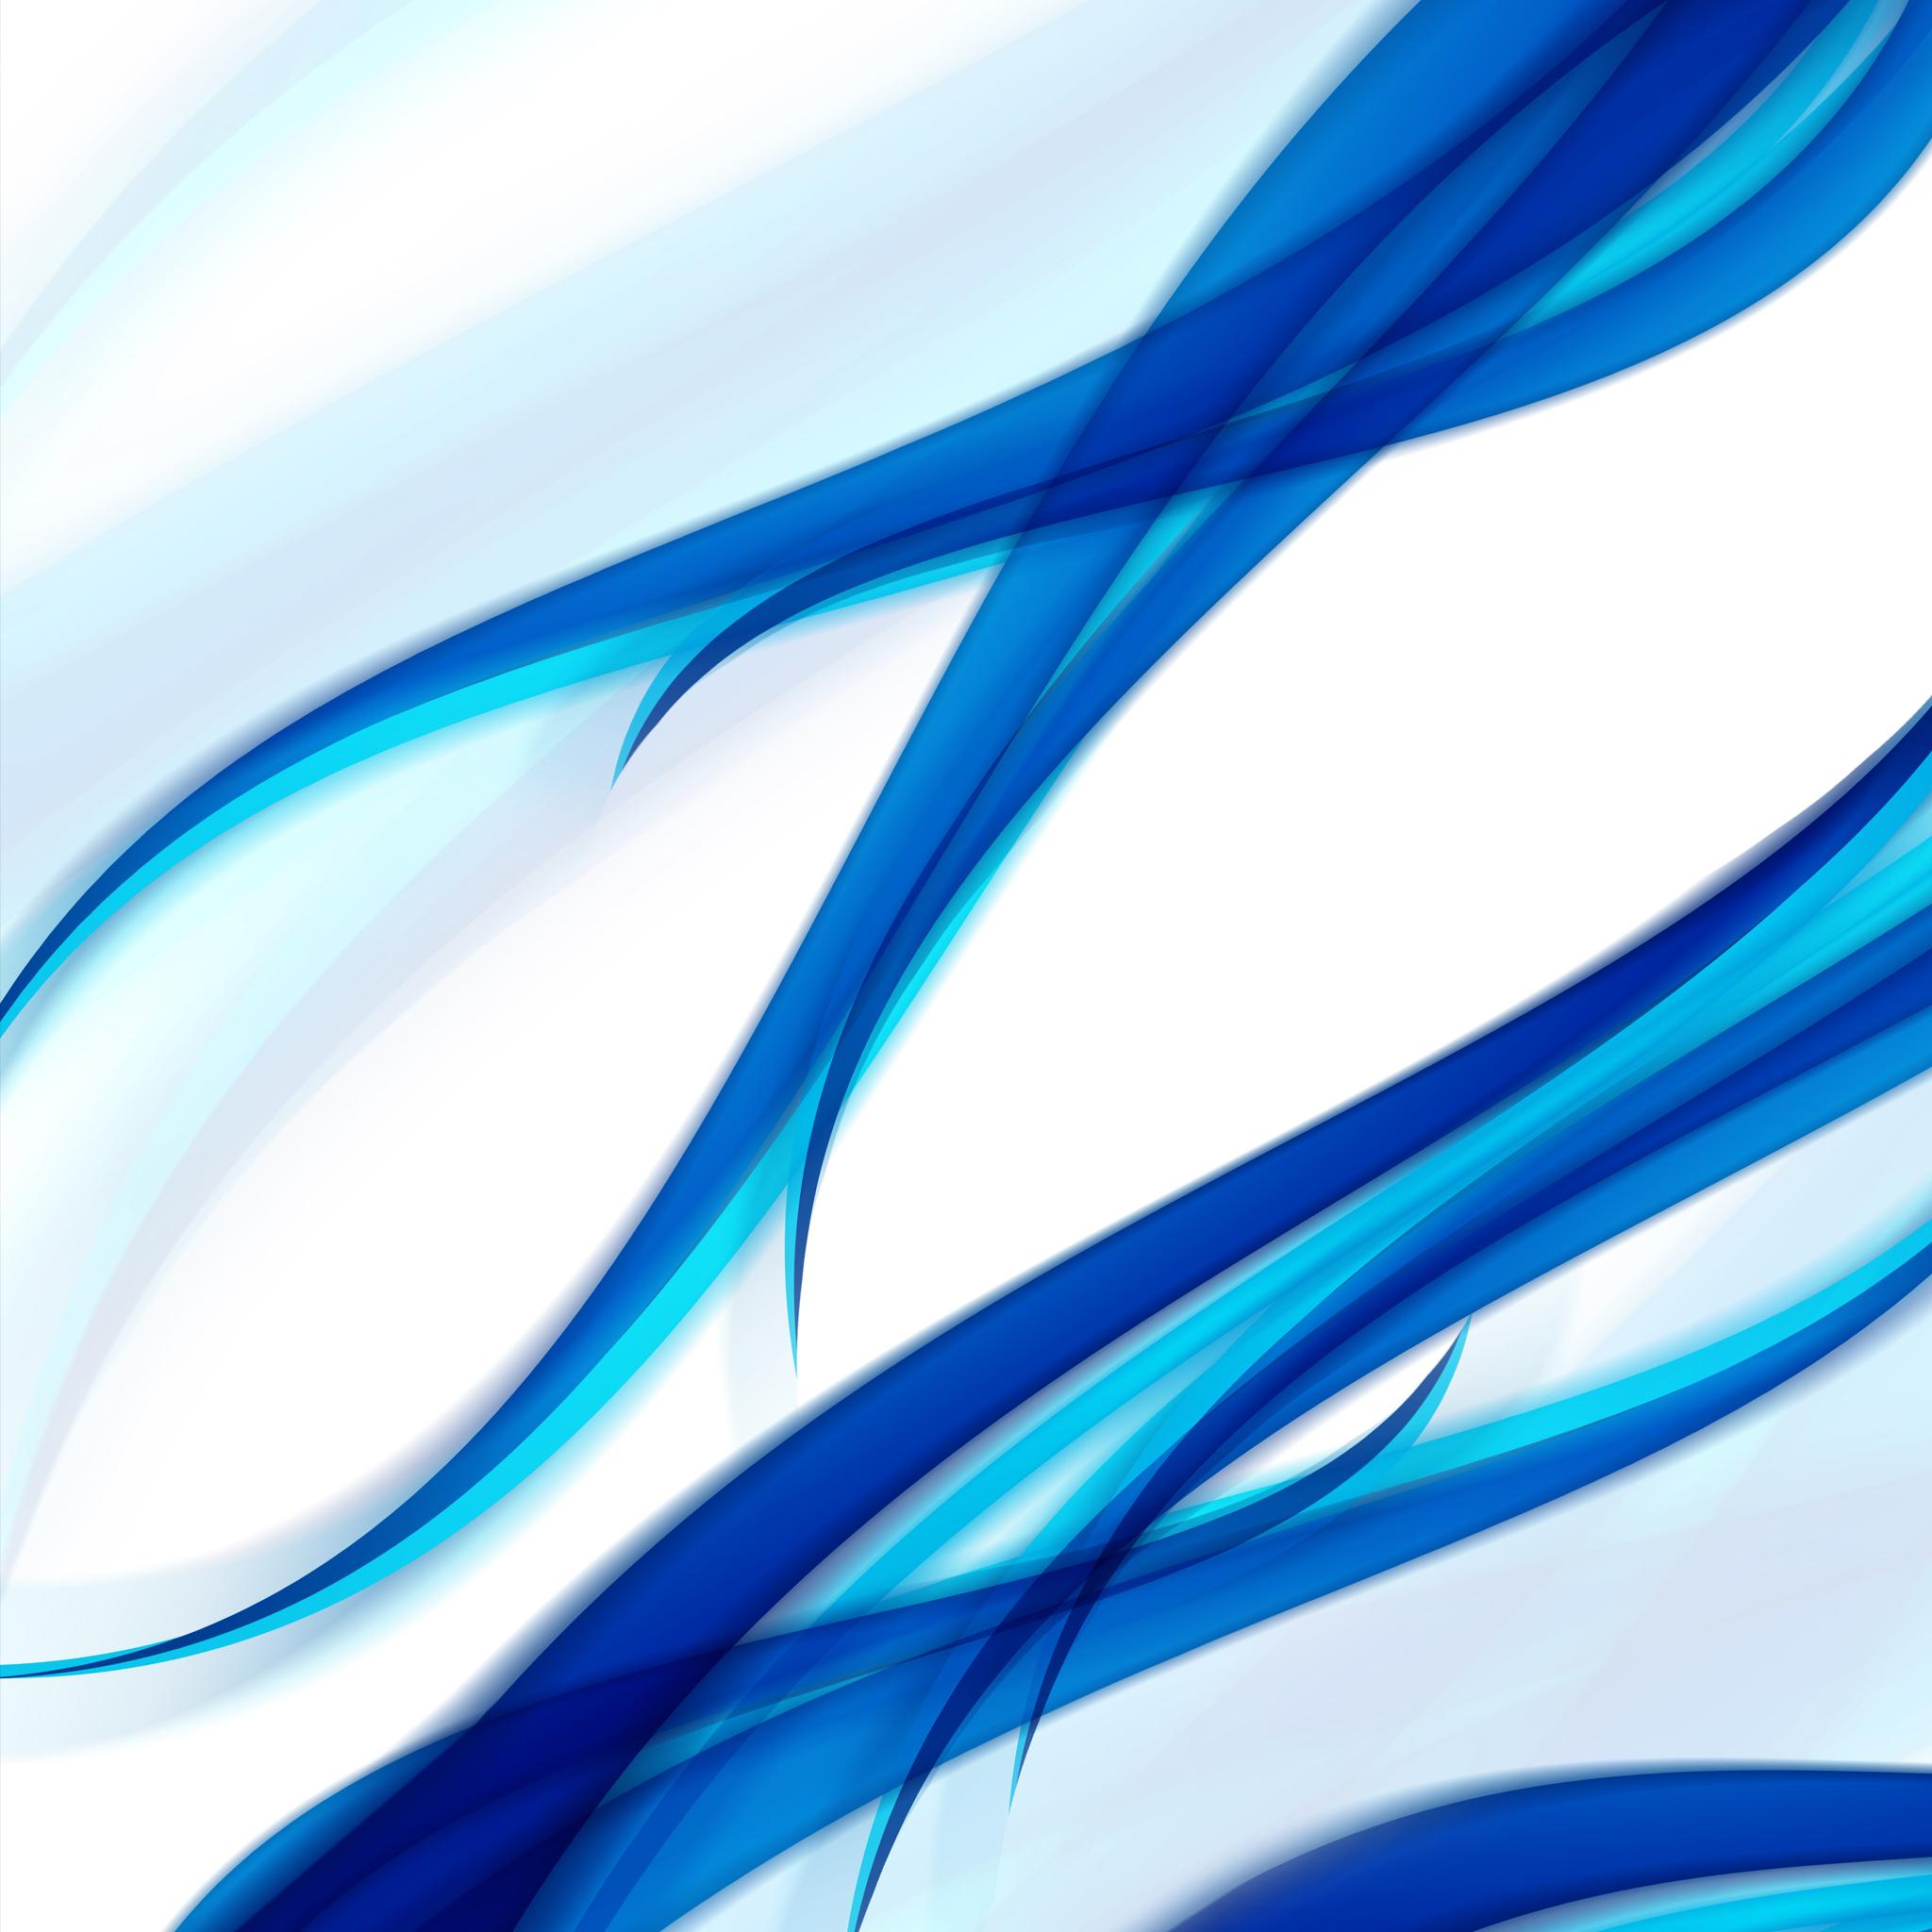 Blue_Waves_Hair_3Wallpapers_iPad